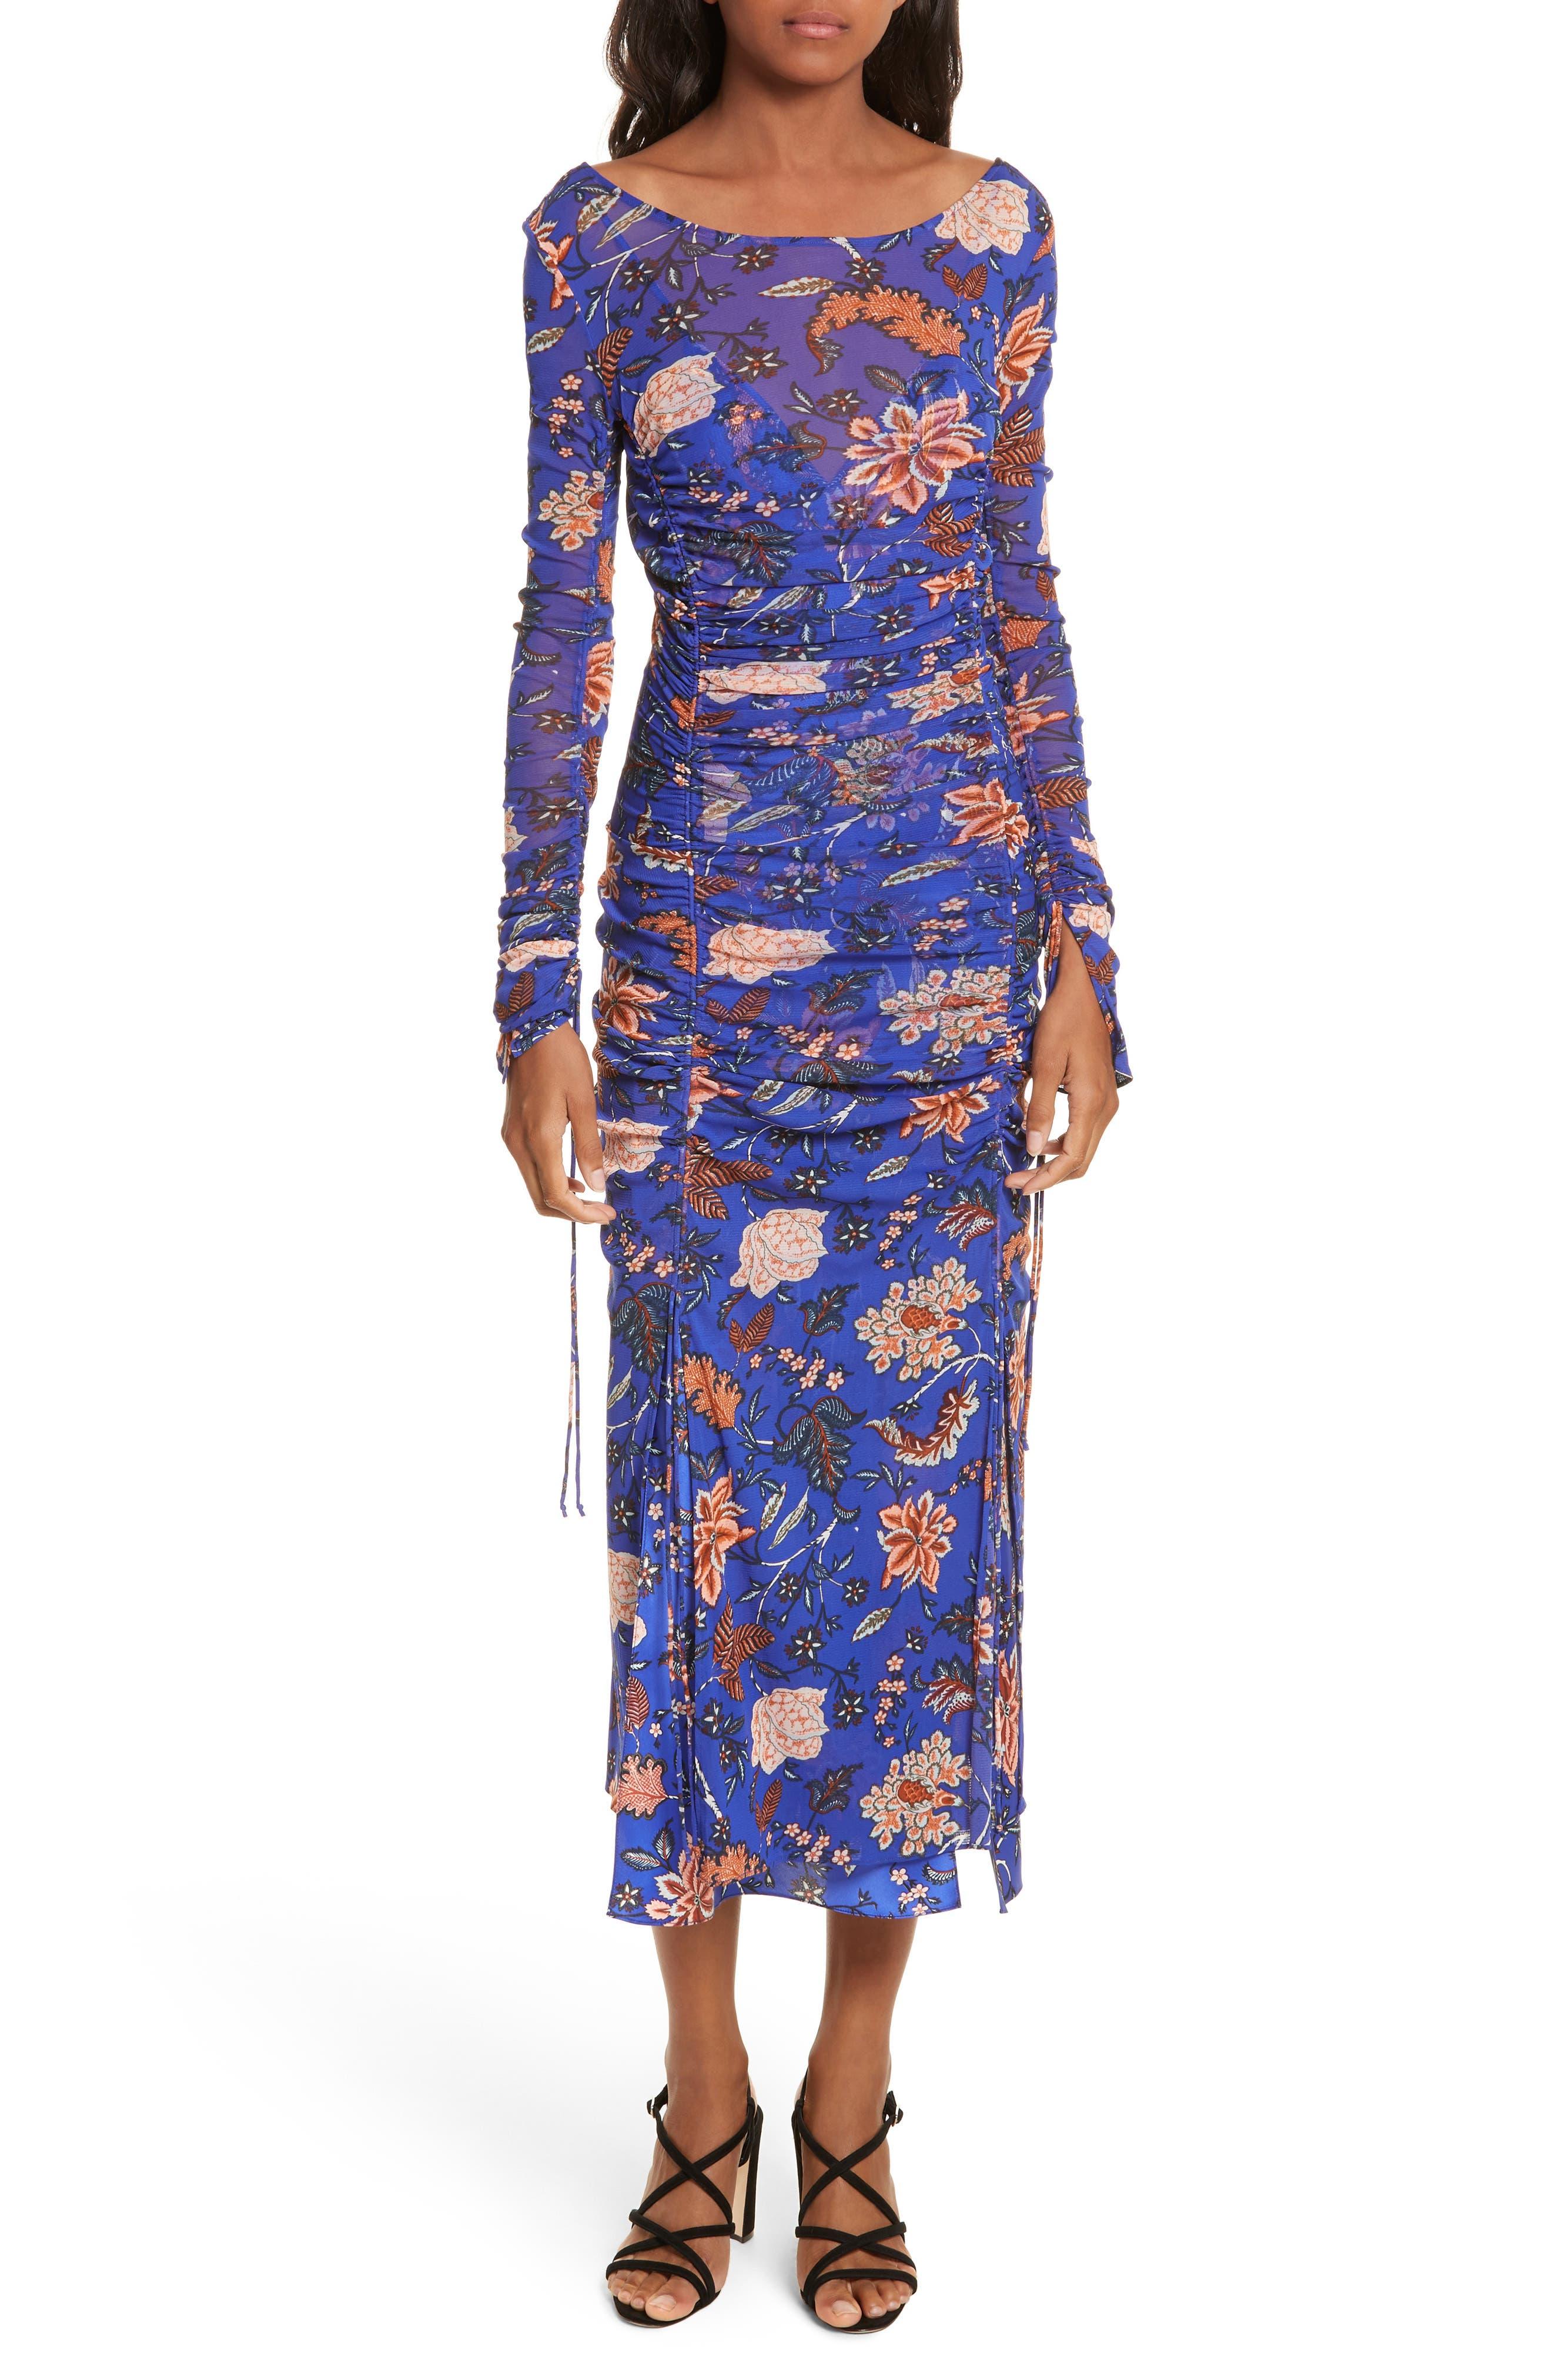 Diane von Furstenberg Mesh Overlay Floral Midi Dress,                         Main,                         color, 533